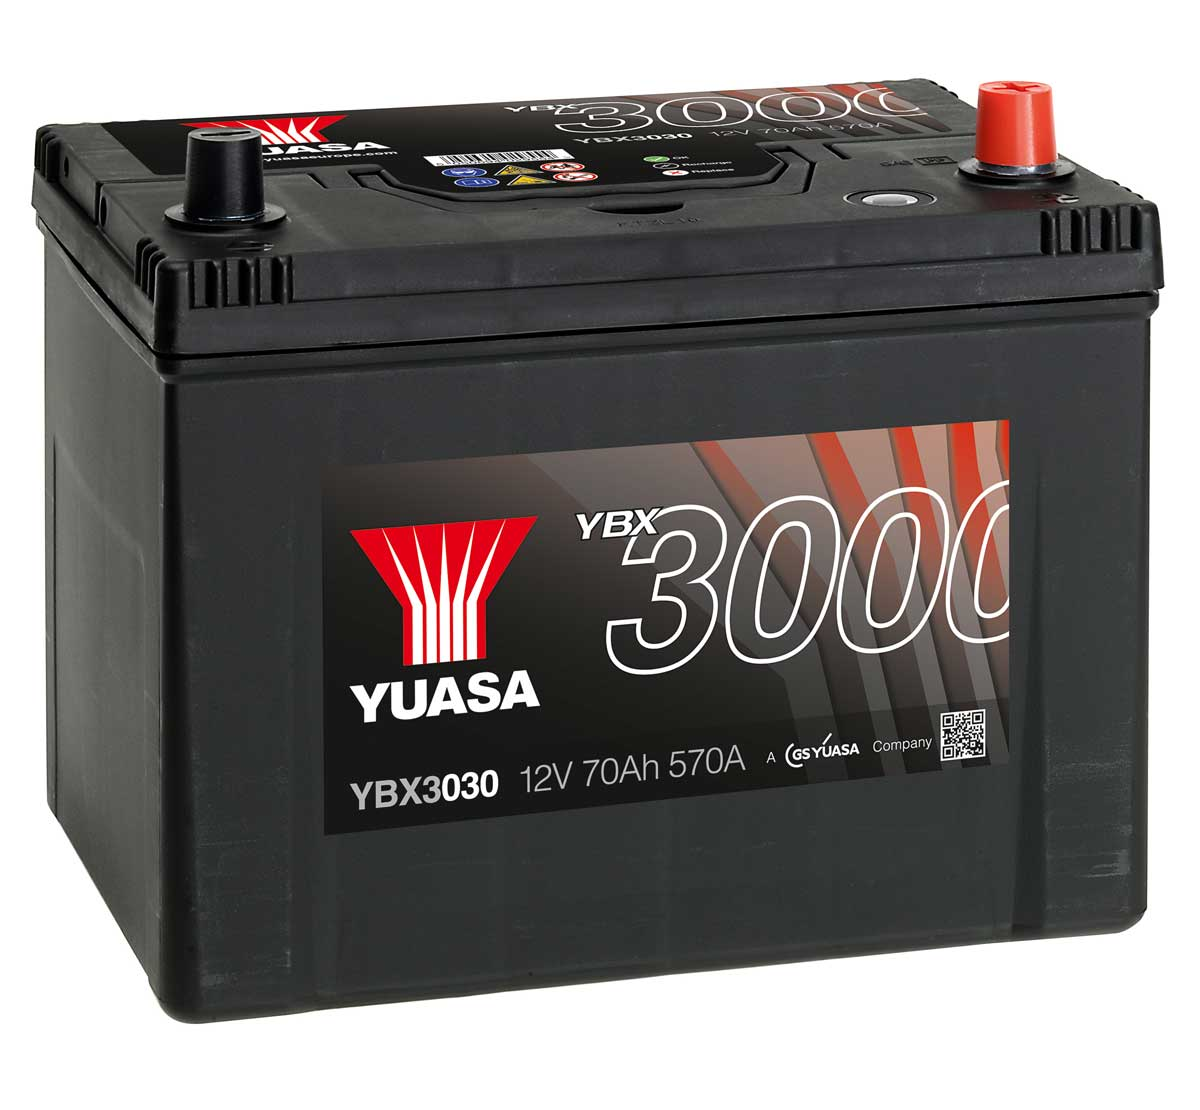 yuasa ybx3030 12v car battery mds battery. Black Bedroom Furniture Sets. Home Design Ideas